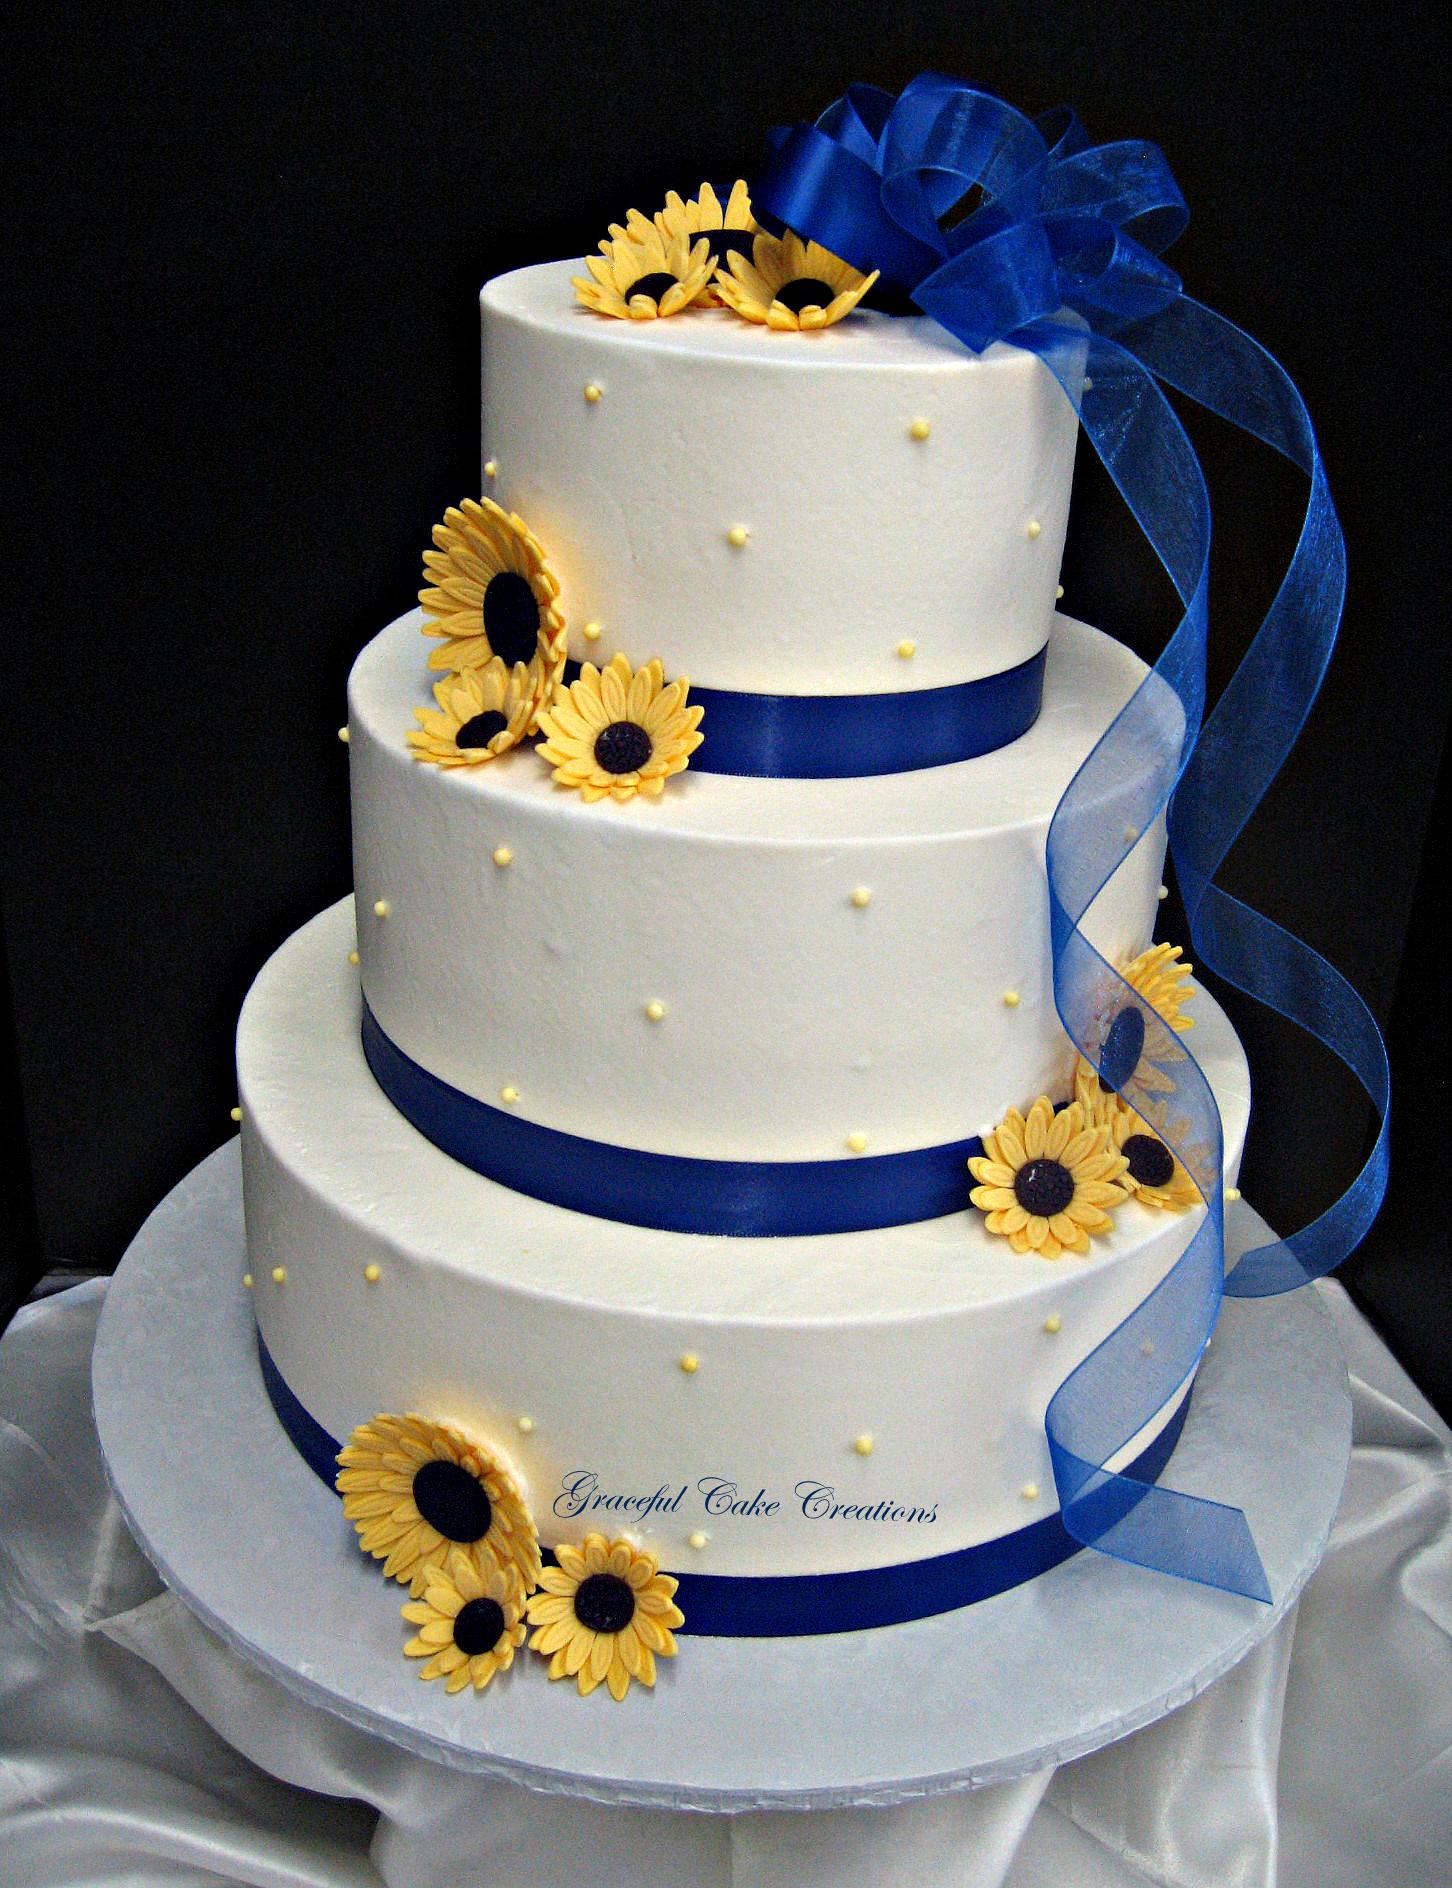 Elegant White Buttercream Wedding Cake With Royal Blue Ribbon And Yellow Daisies